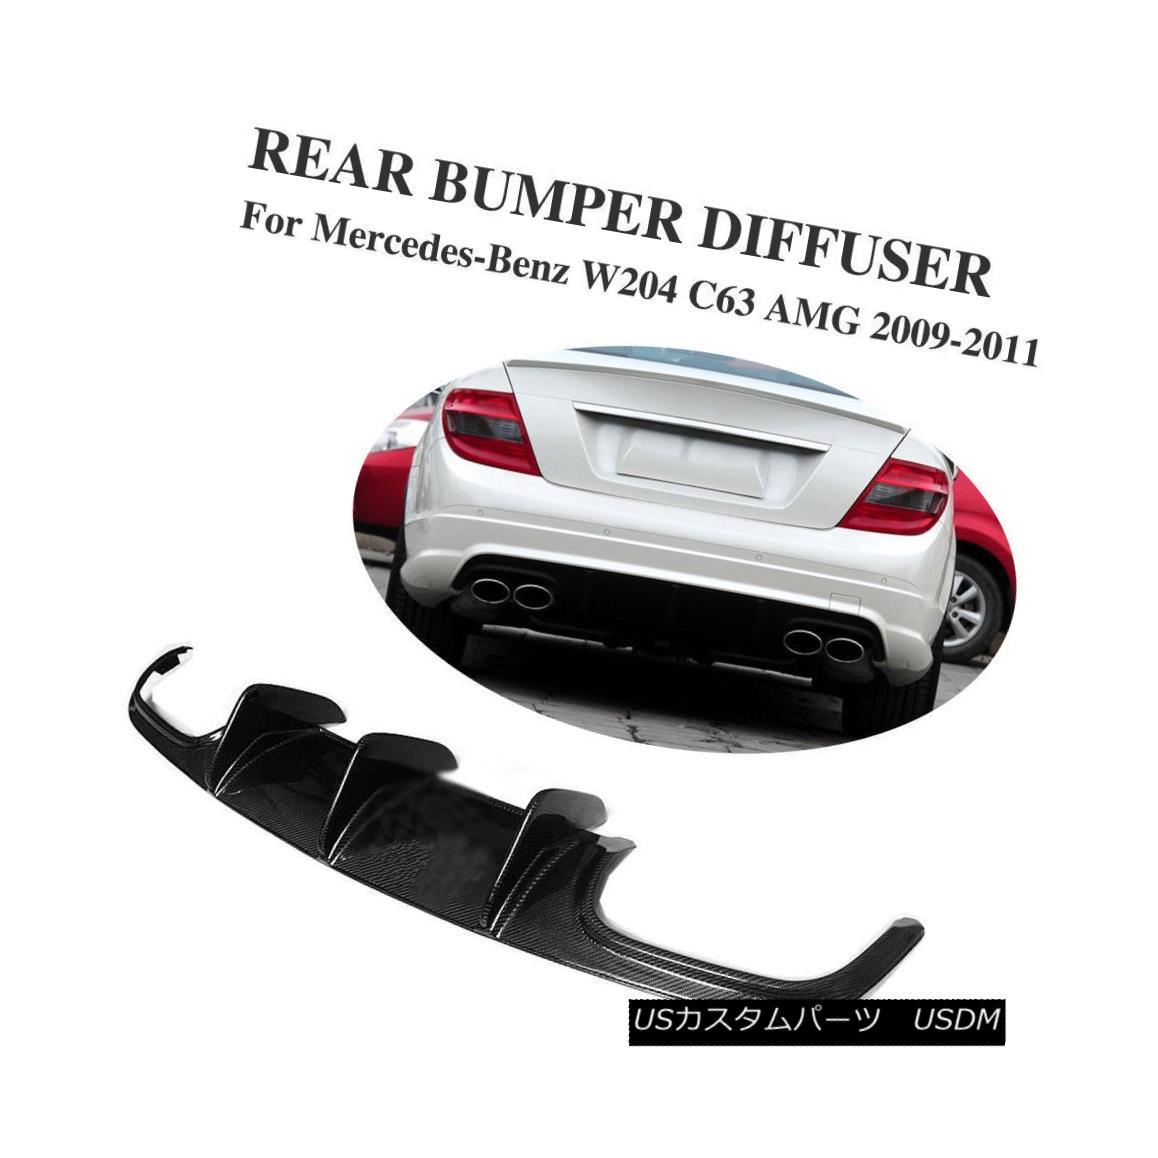 W204 Mercedes C63 09-11 Diffuser Big Fiber 09-11 ビッグフィンカーボンファイバーリアバンパーディフューザーメルセデスベンツW204 エアロパーツ Fins Carbon AMG AMG Rear Benz C63 Bumper for